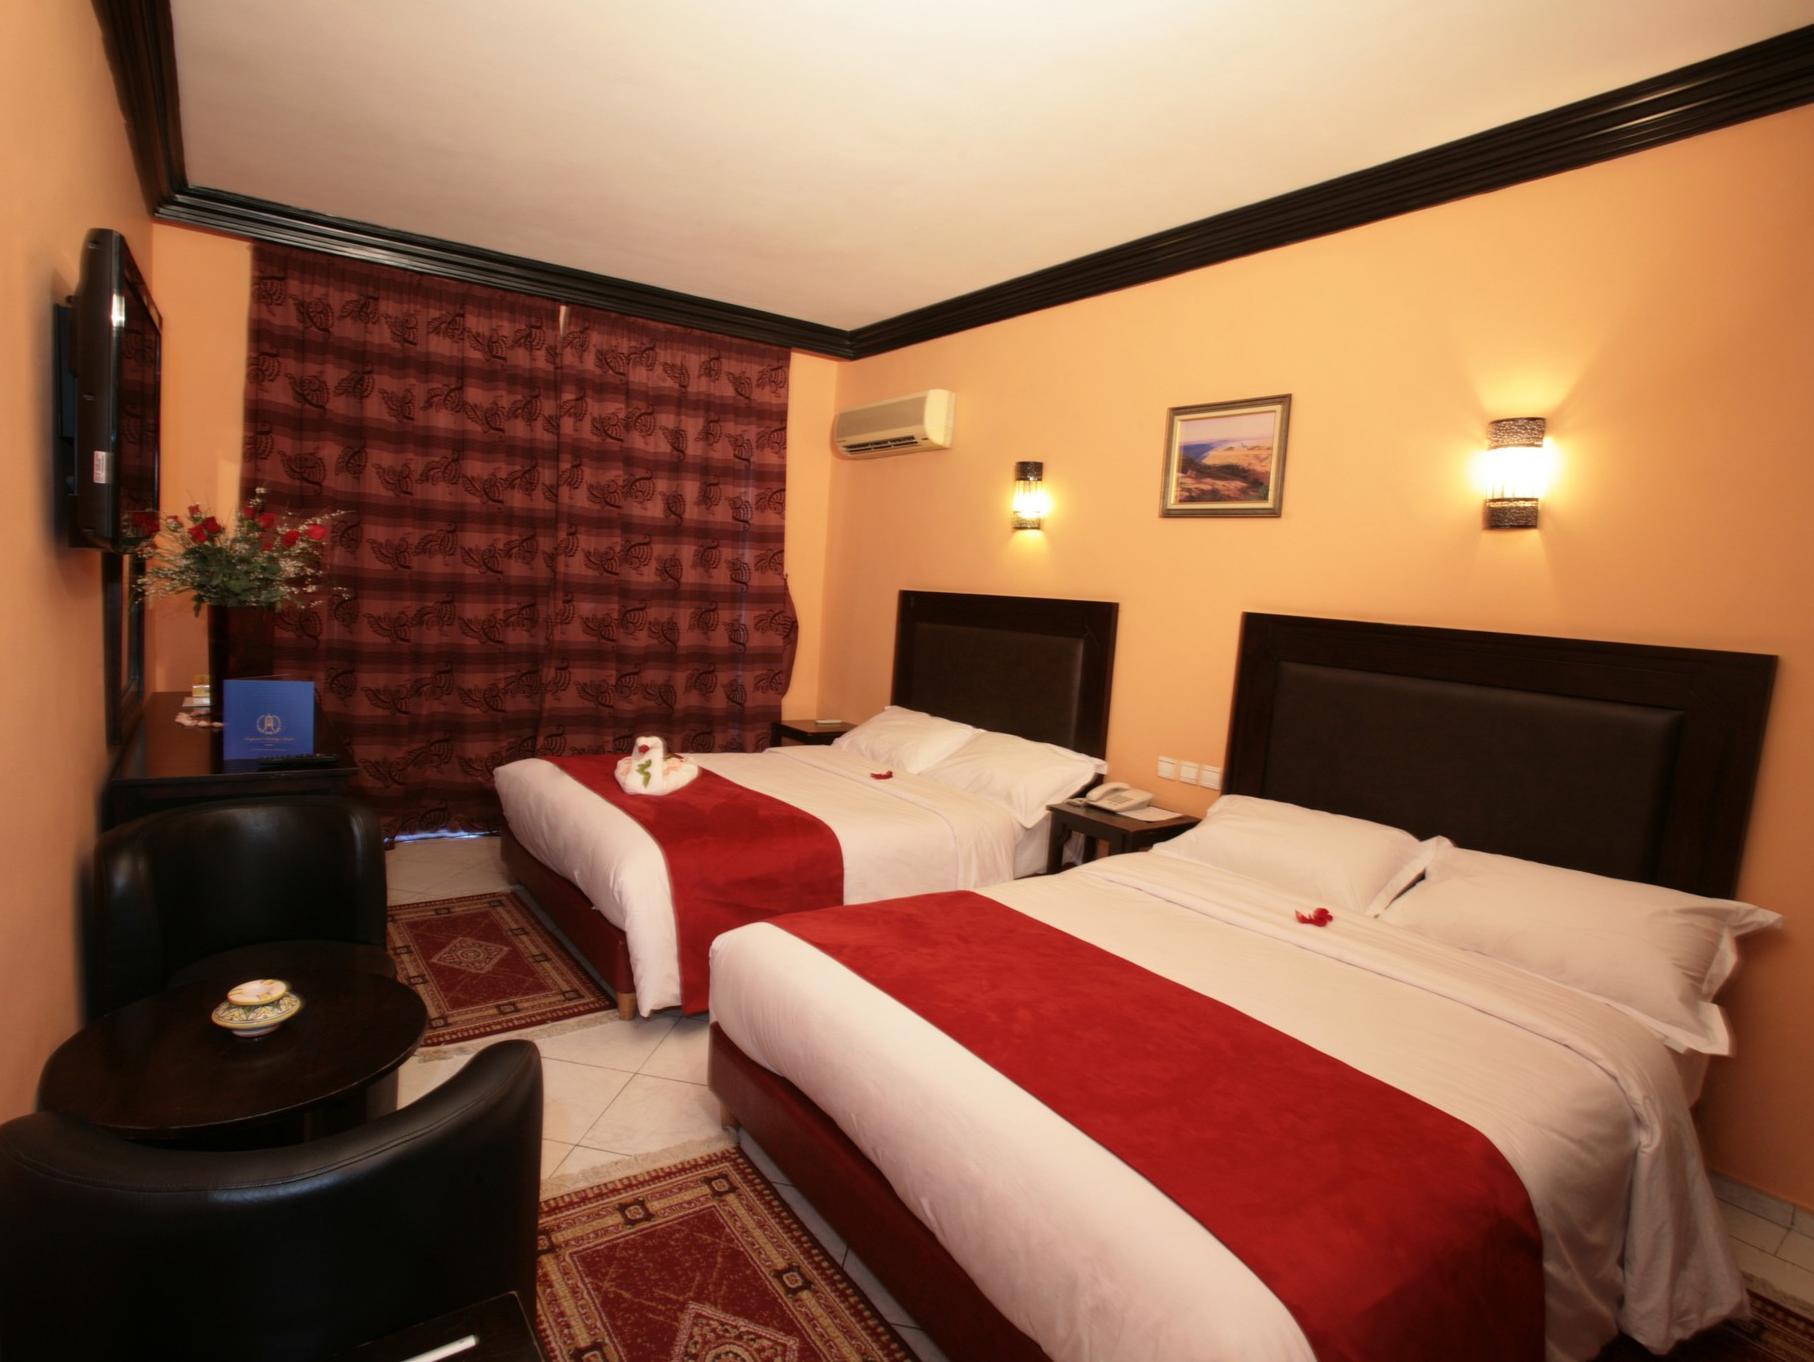 Imperial holiday hotel marrakech Рoffres sp̩ciales pour cet h̫tel